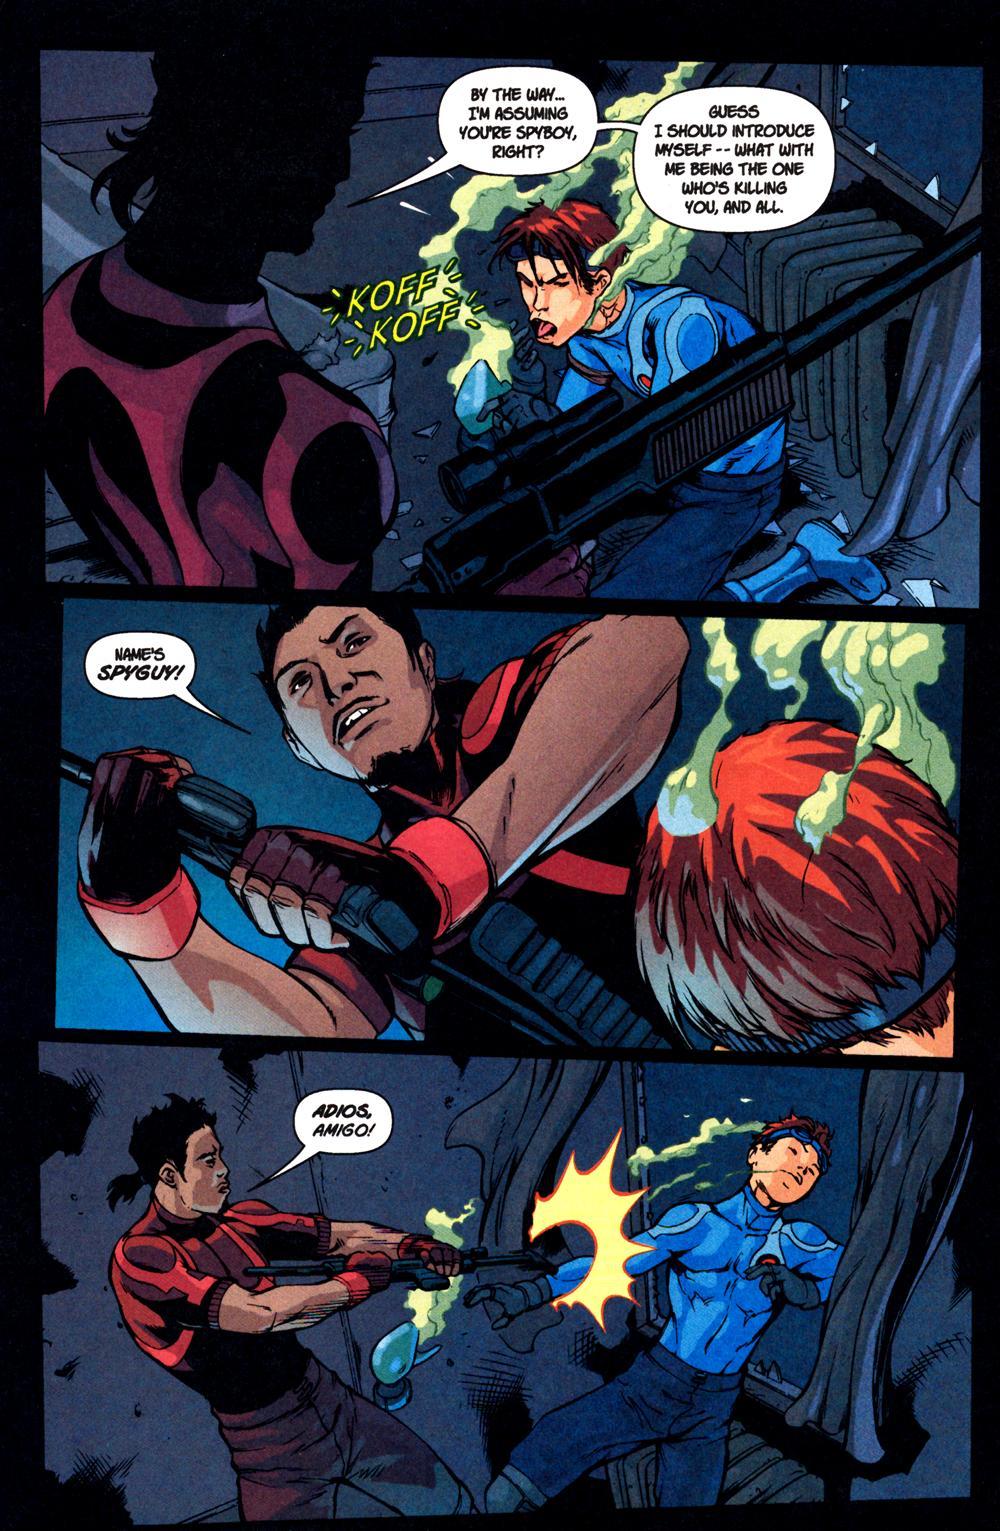 Read online SpyBoy: Final Exam comic -  Issue #1 - 8